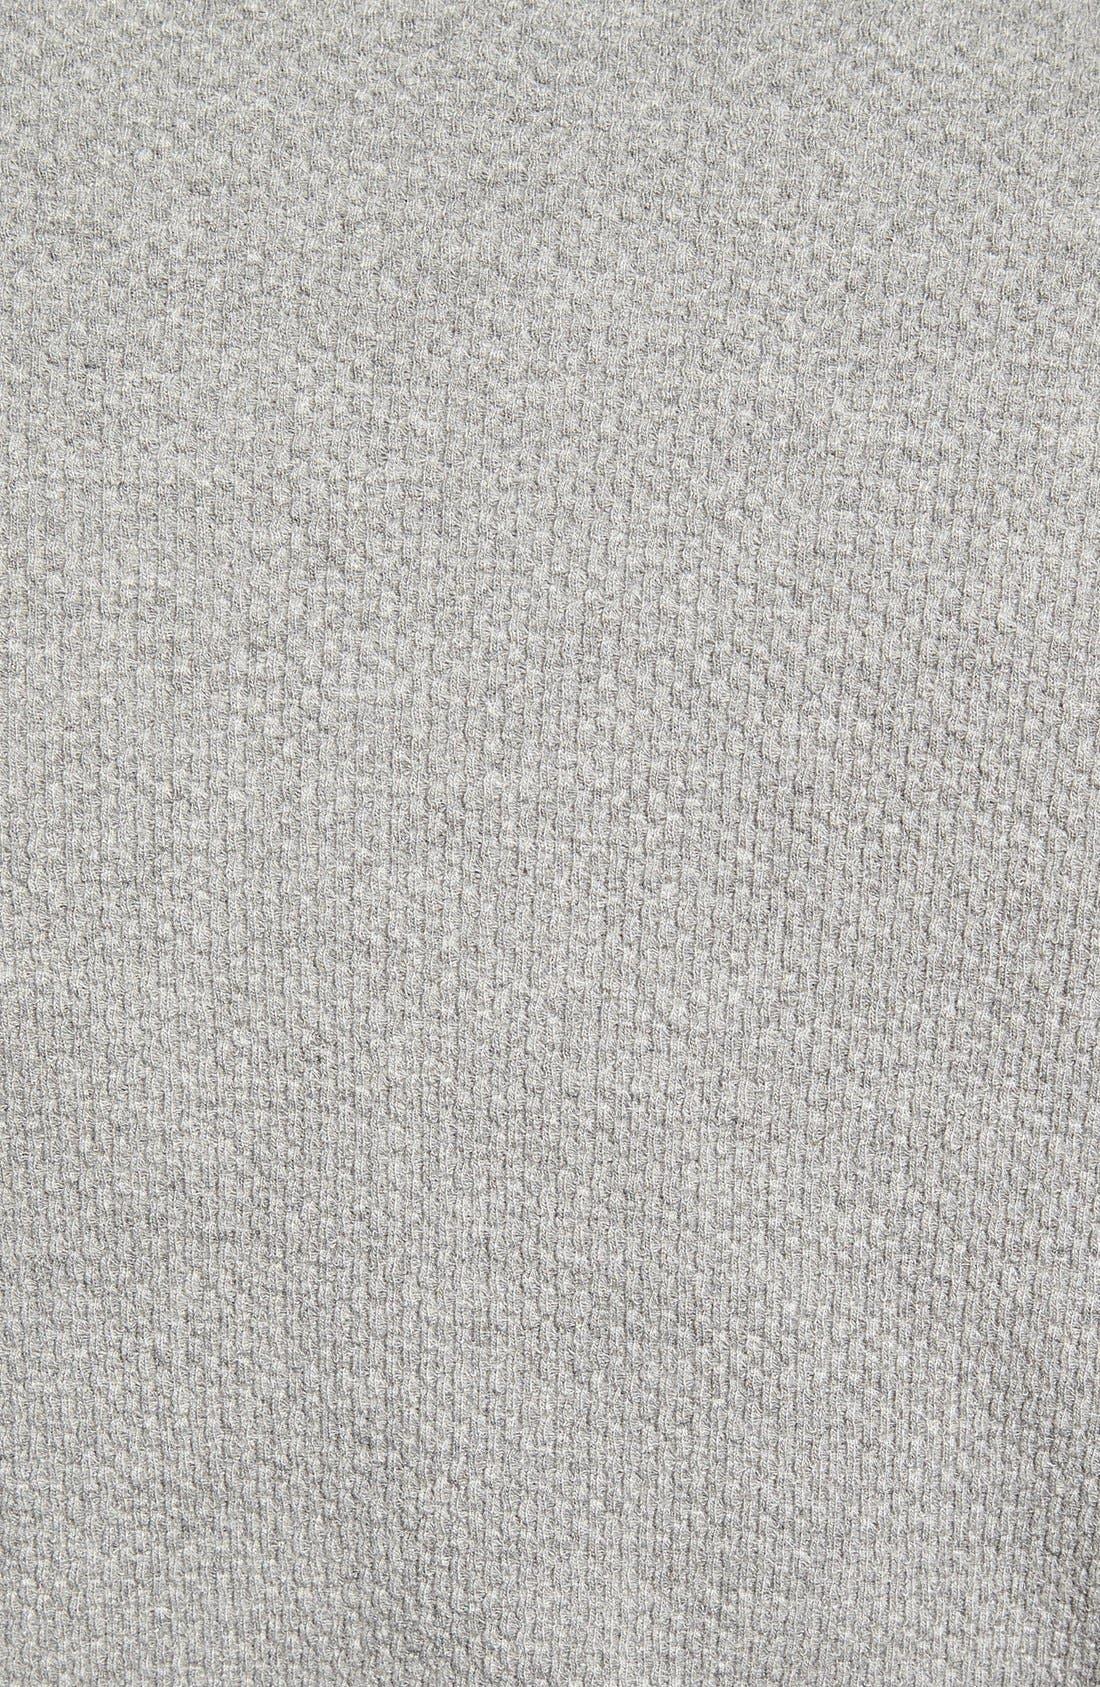 Alternate Image 3  - Nordstrom Men's Shop Thermal Knit Robe